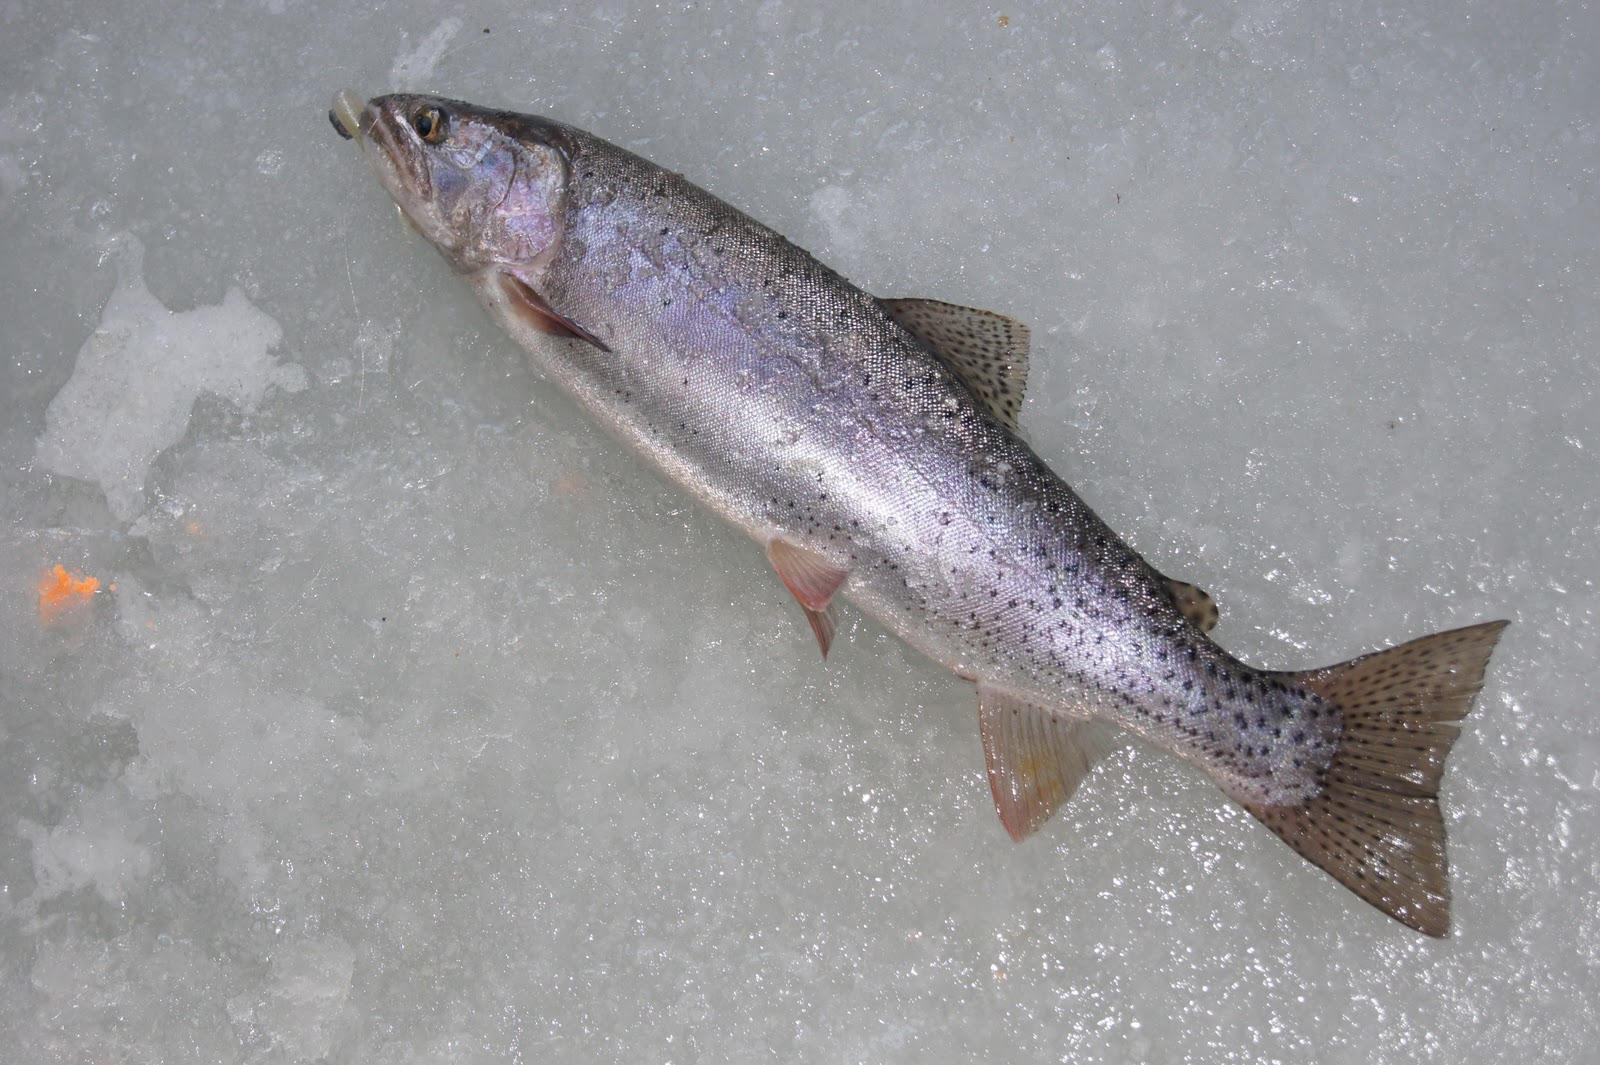 Southern utah hunt and fish panguitch lake dec 9 2011 for Panguitch lake fishing report